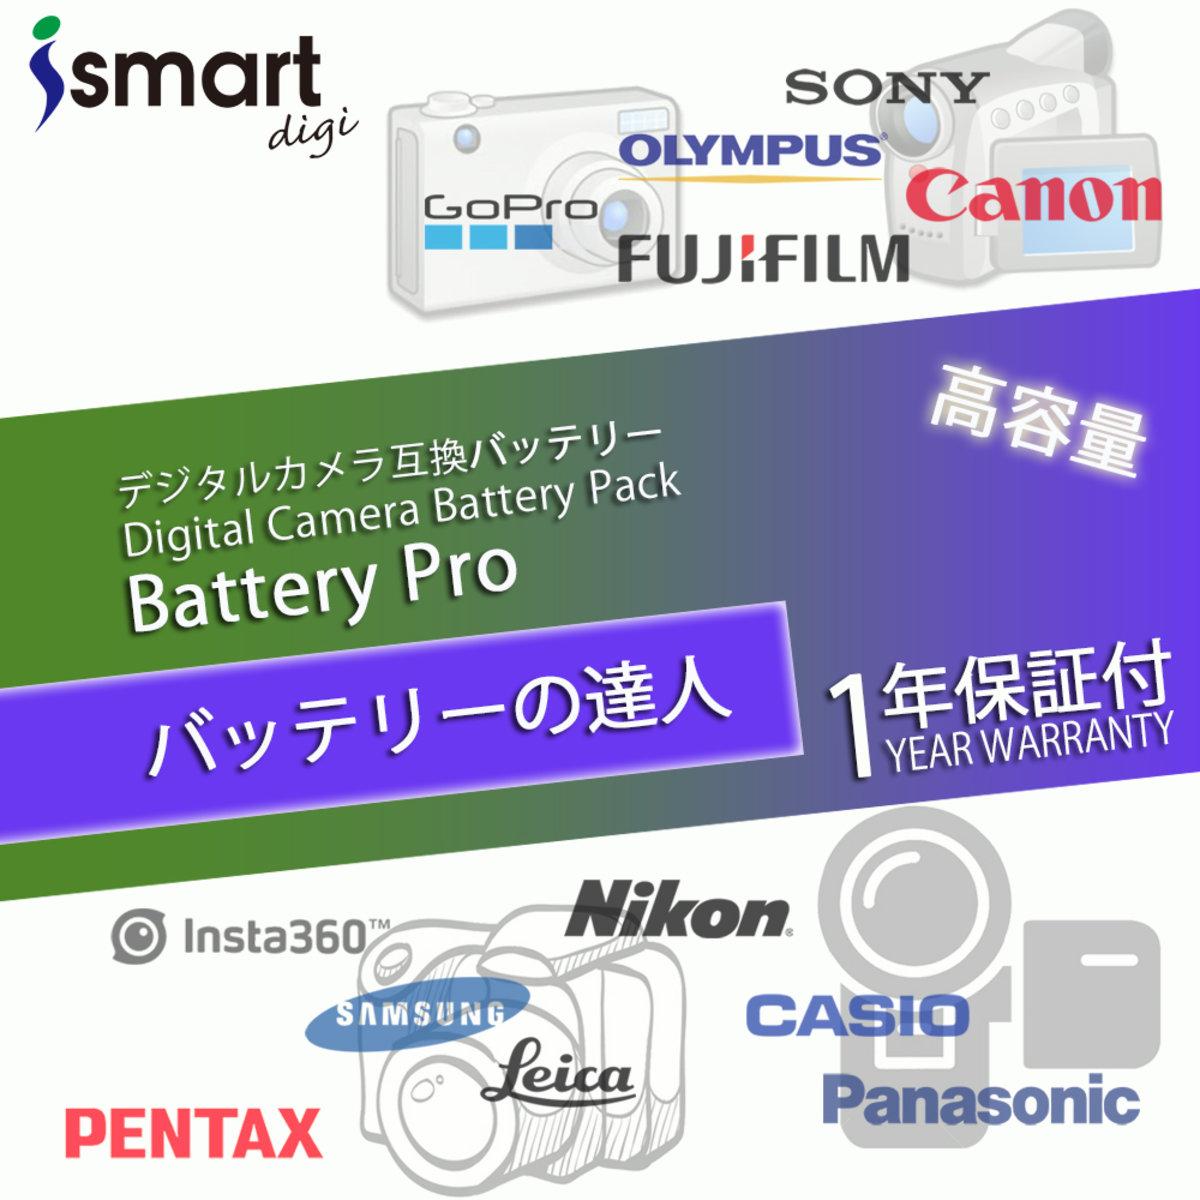 Sony Digital Camera Battery (For:DSLR-A330, DSLR-A380, Cyber-shot DSC-HX1, HDR-XR520, HDR-TG5, HDR-XR500, HDR-CX500, HDR-CX100, DCR-SR47)